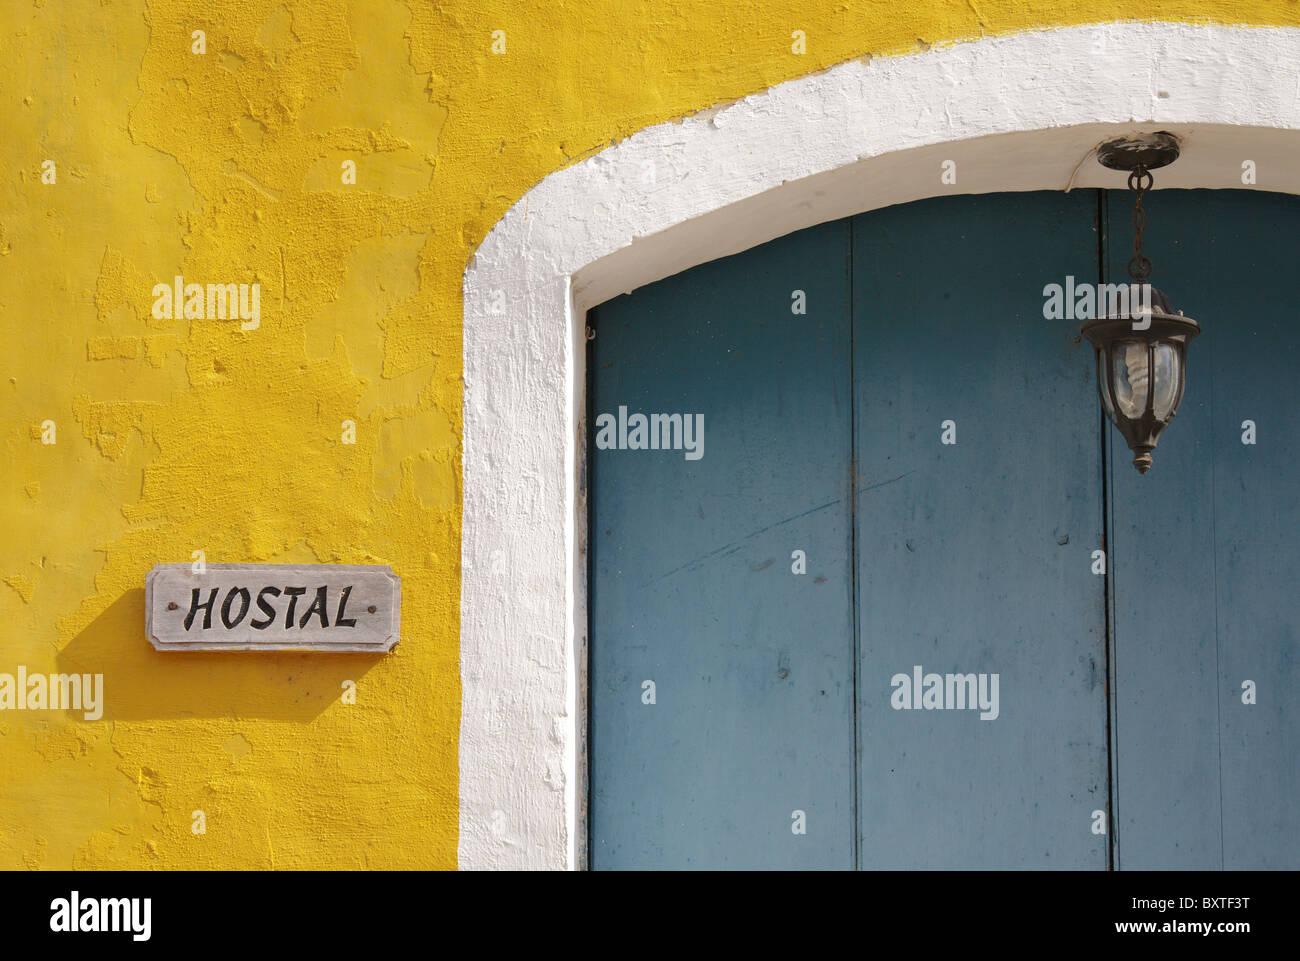 TRINIDAD: HOSTAL SIGN AND DOORWAY - Stock Image